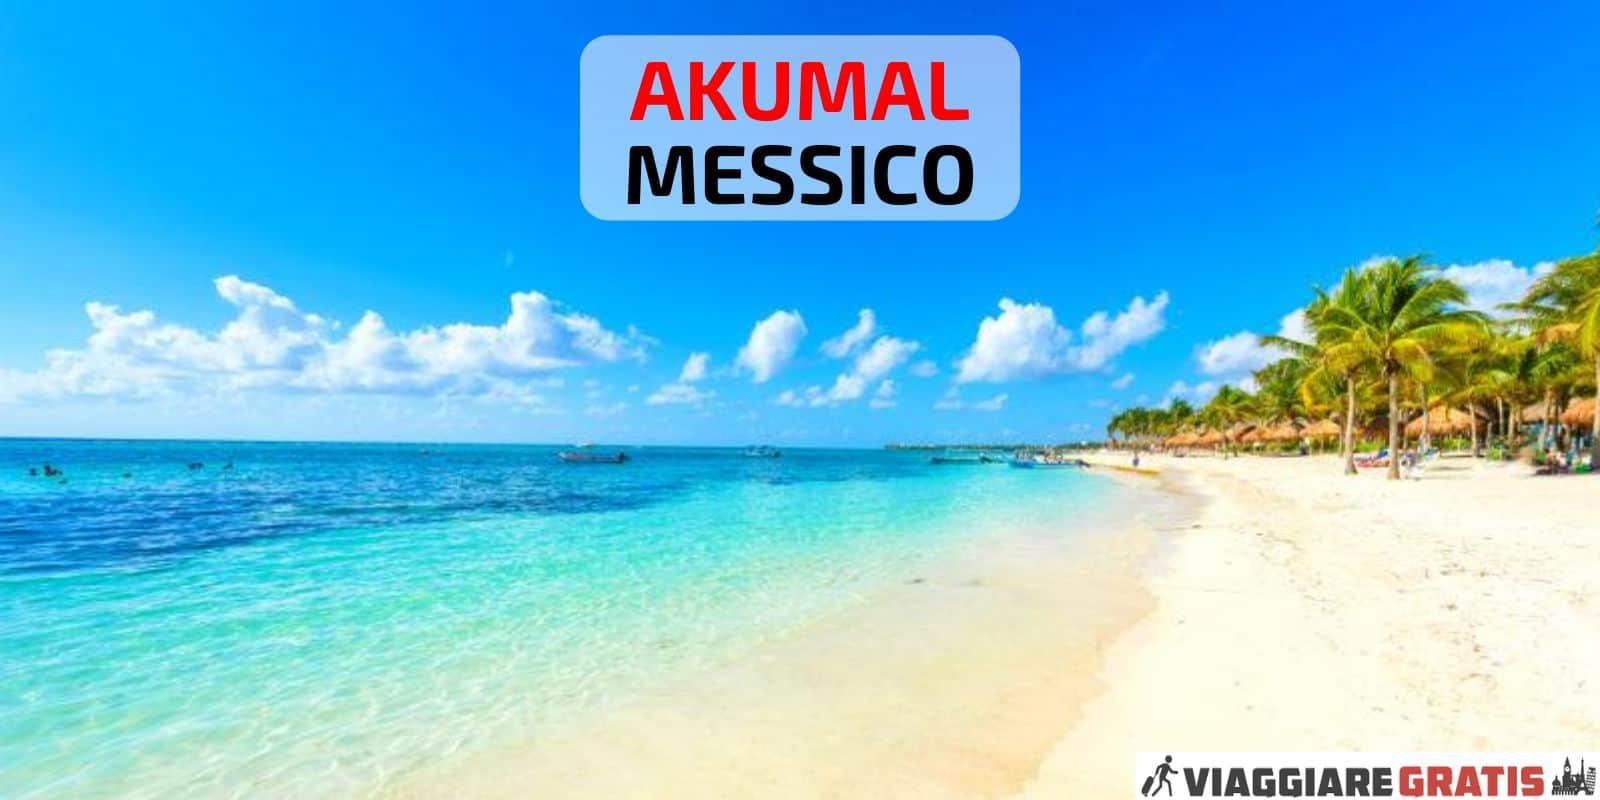 Akumal Messico tartarughe